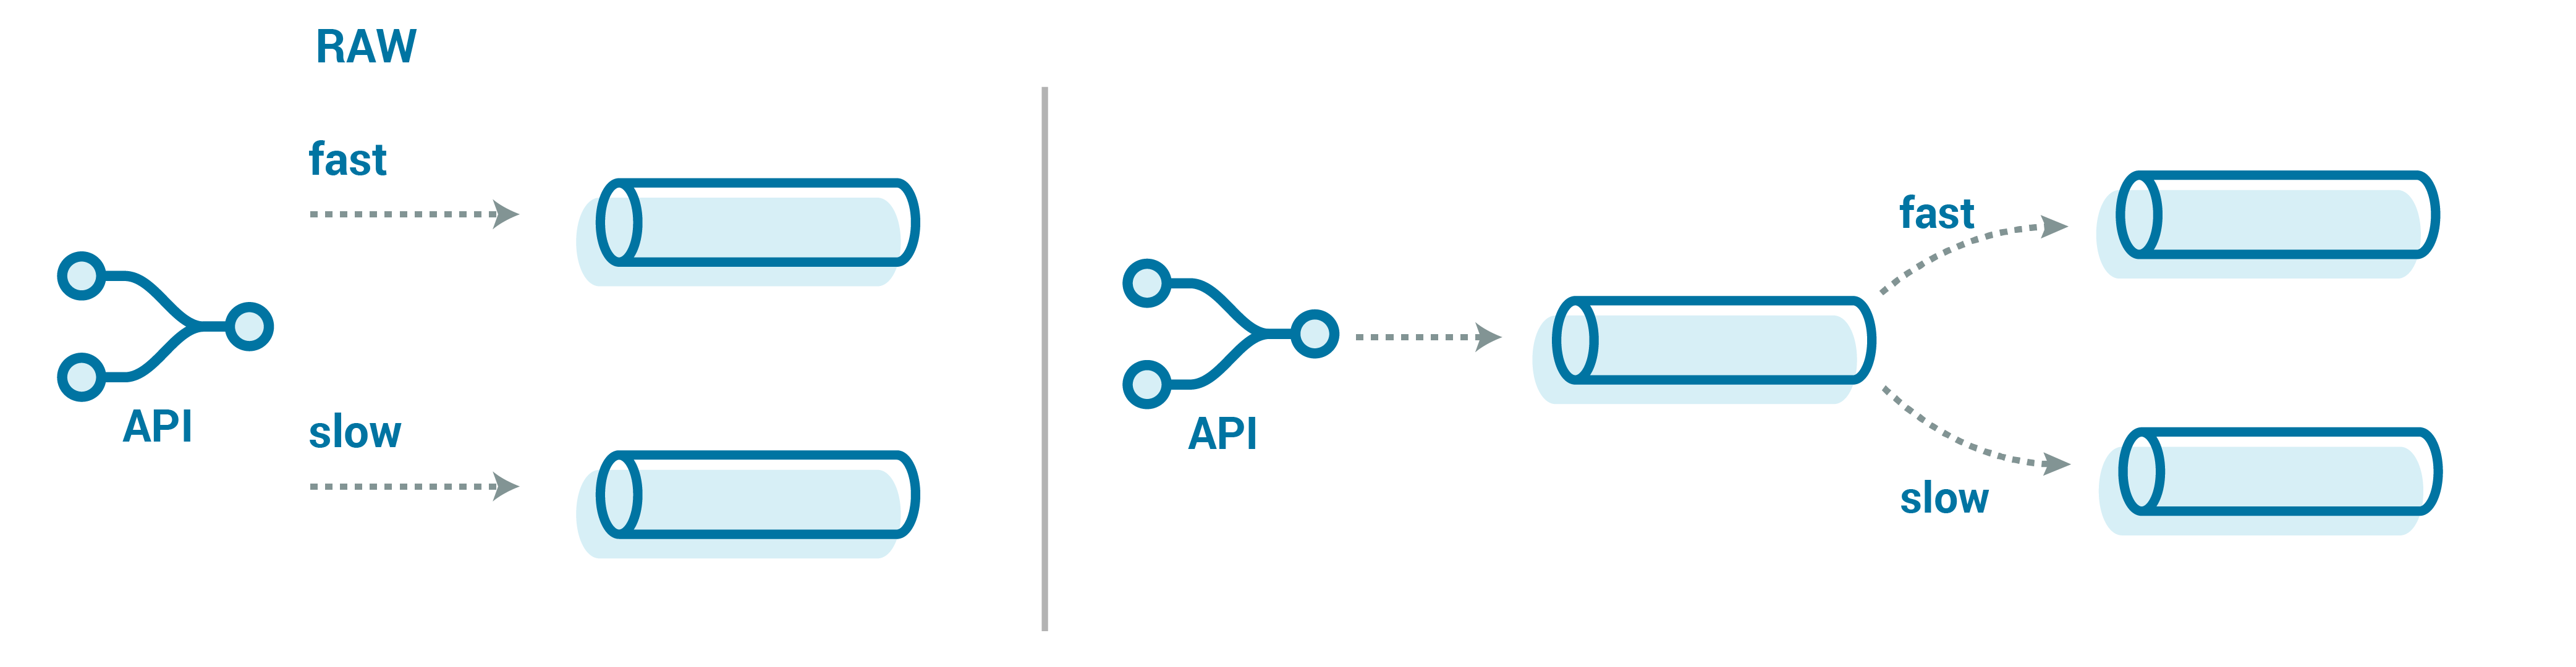 API ➝ Fast | Slow